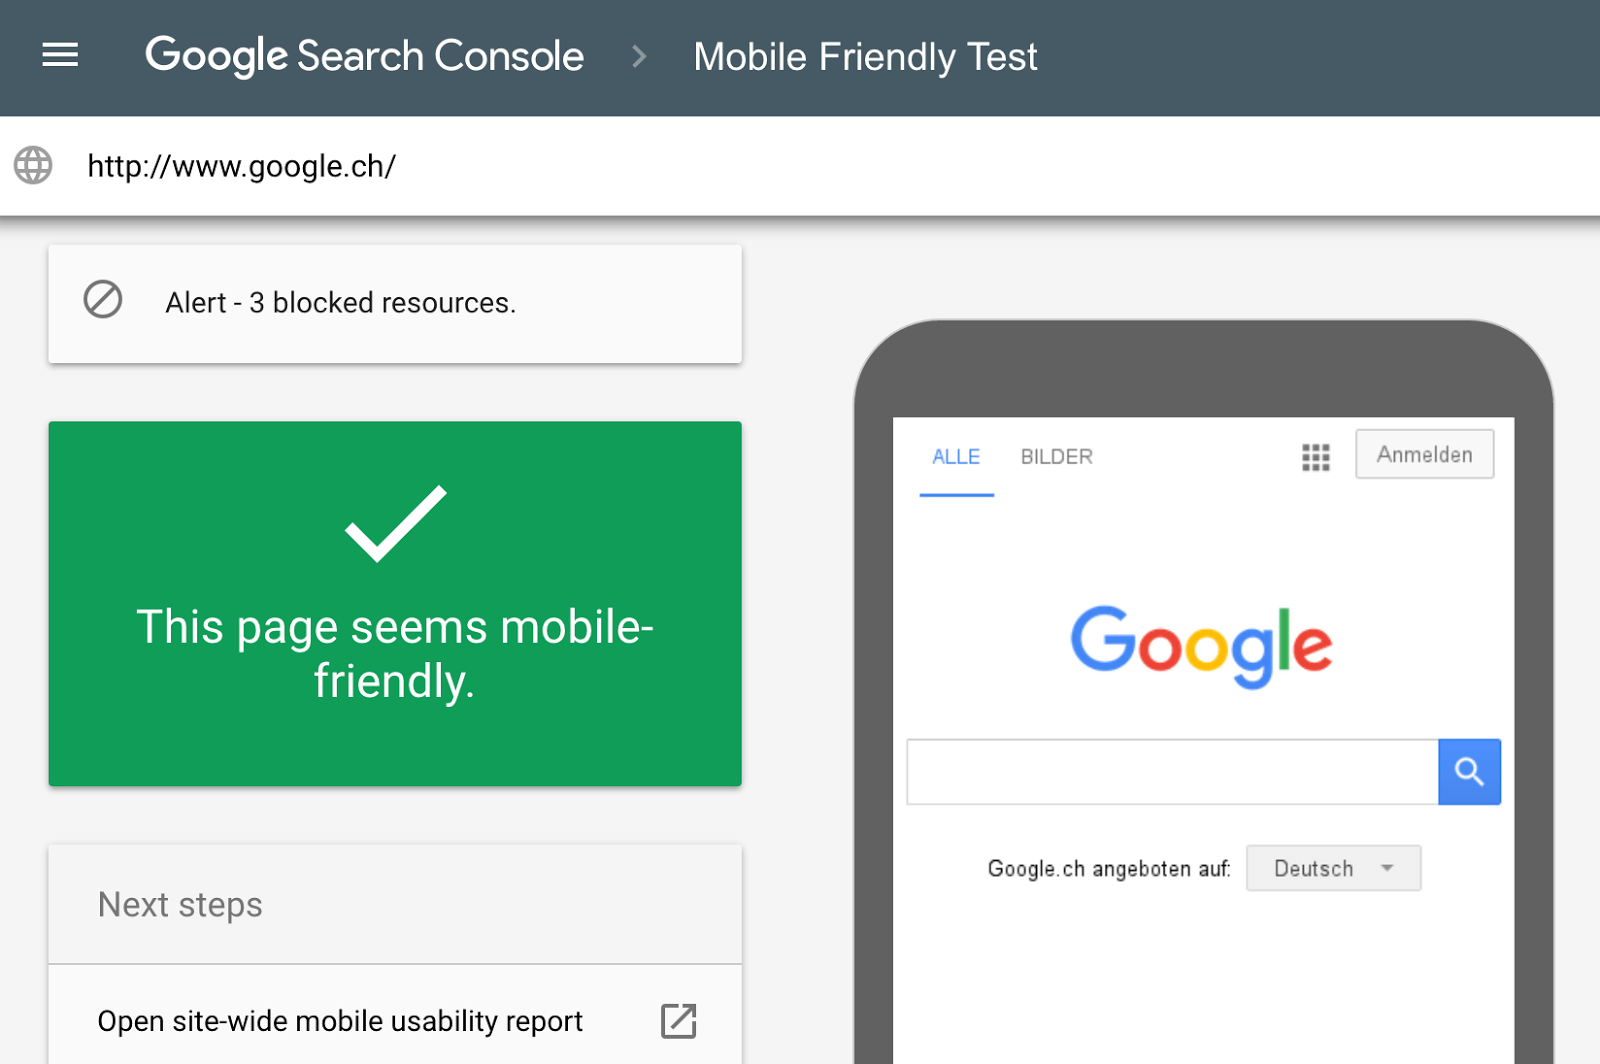 googlemobilefriendlytest2